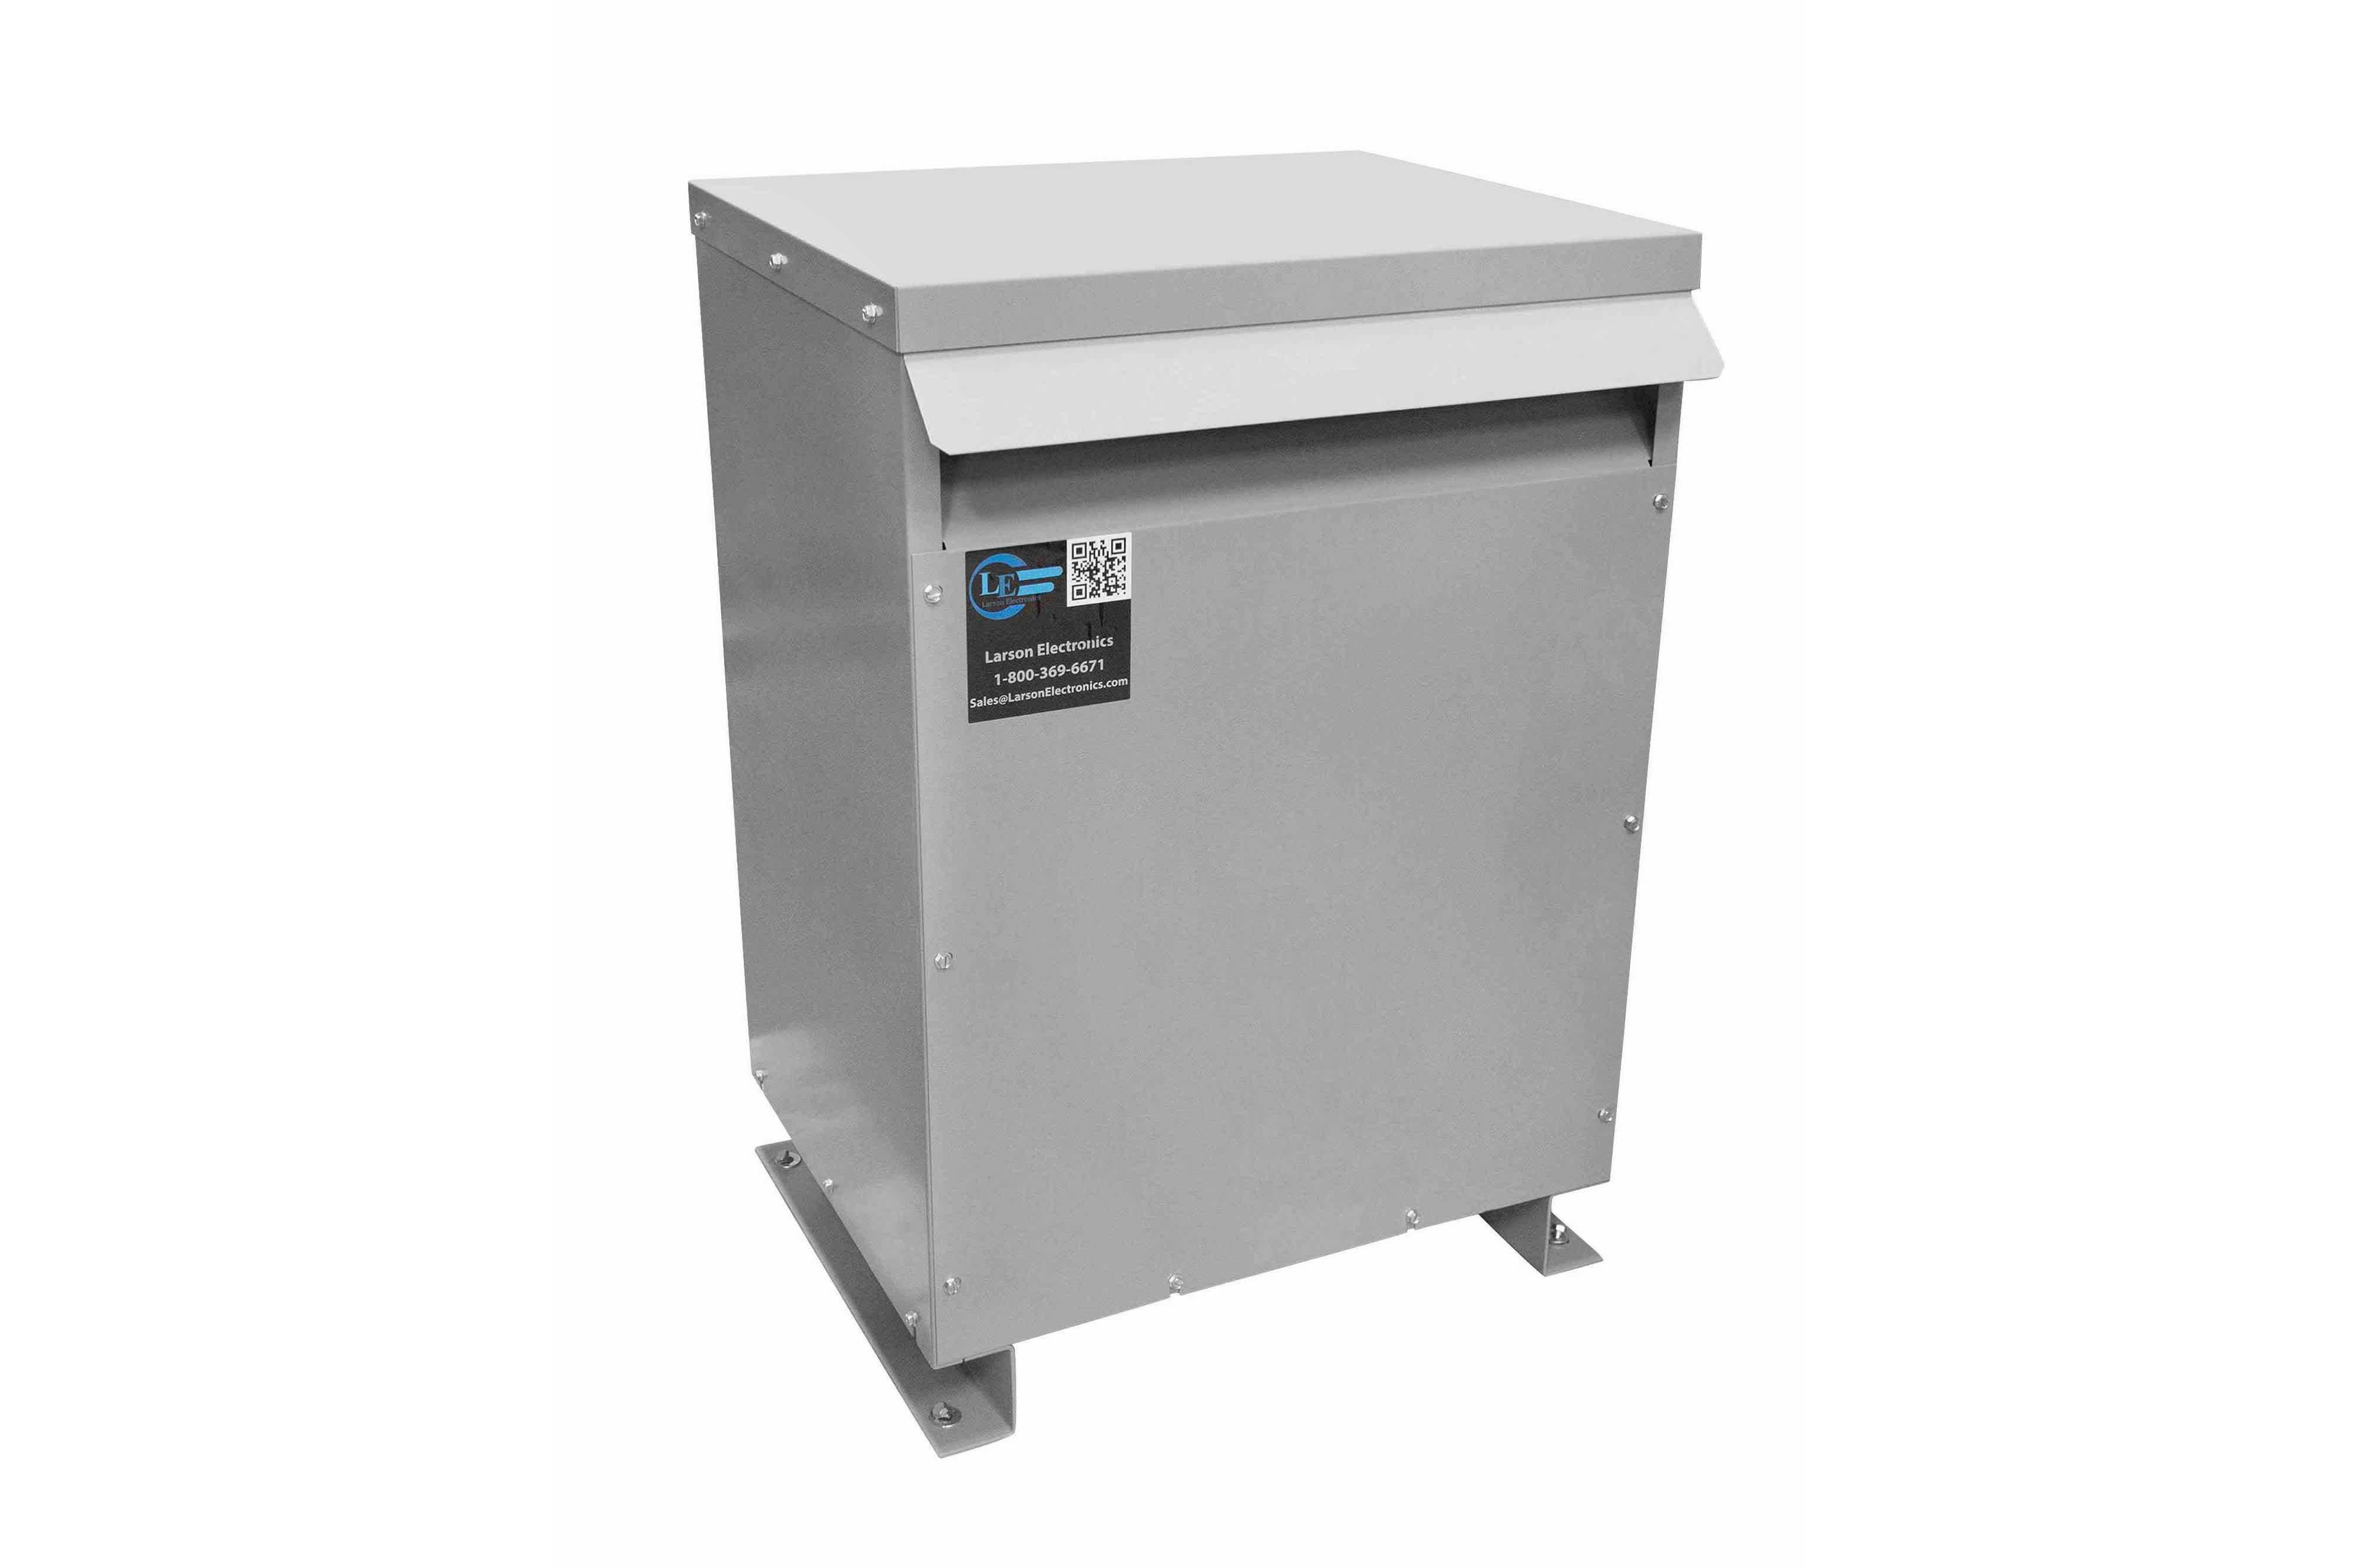 200 kVA 3PH Isolation Transformer, 575V Wye Primary, 415Y/240 Wye-N Secondary, N3R, Ventilated, 60 Hz